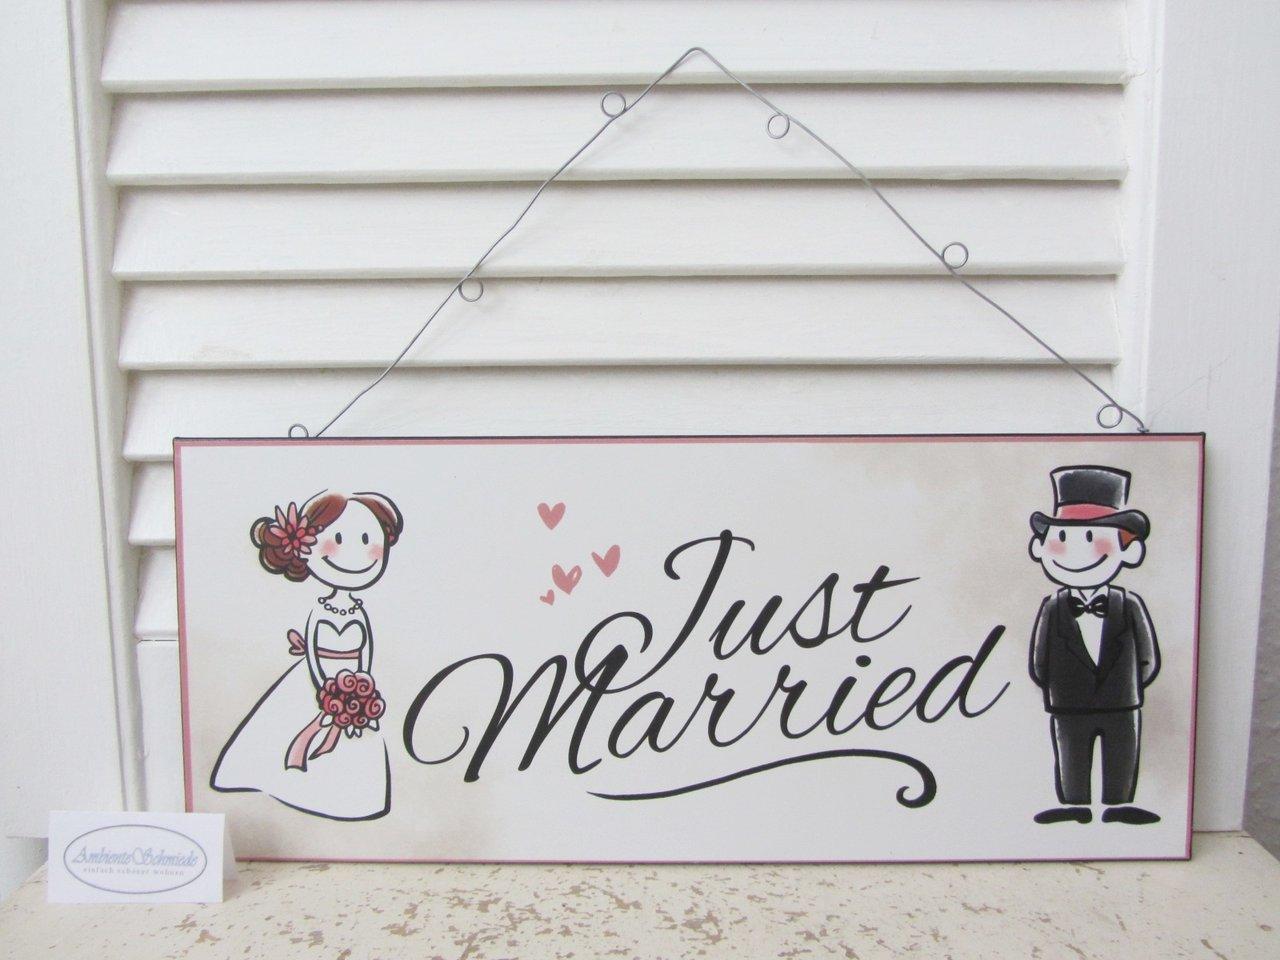 Deko Schild Bild Just Married Geschenk Hochzeit Frisch Verheiratet Ehepaar Metall Shabby Ambienteschmiede